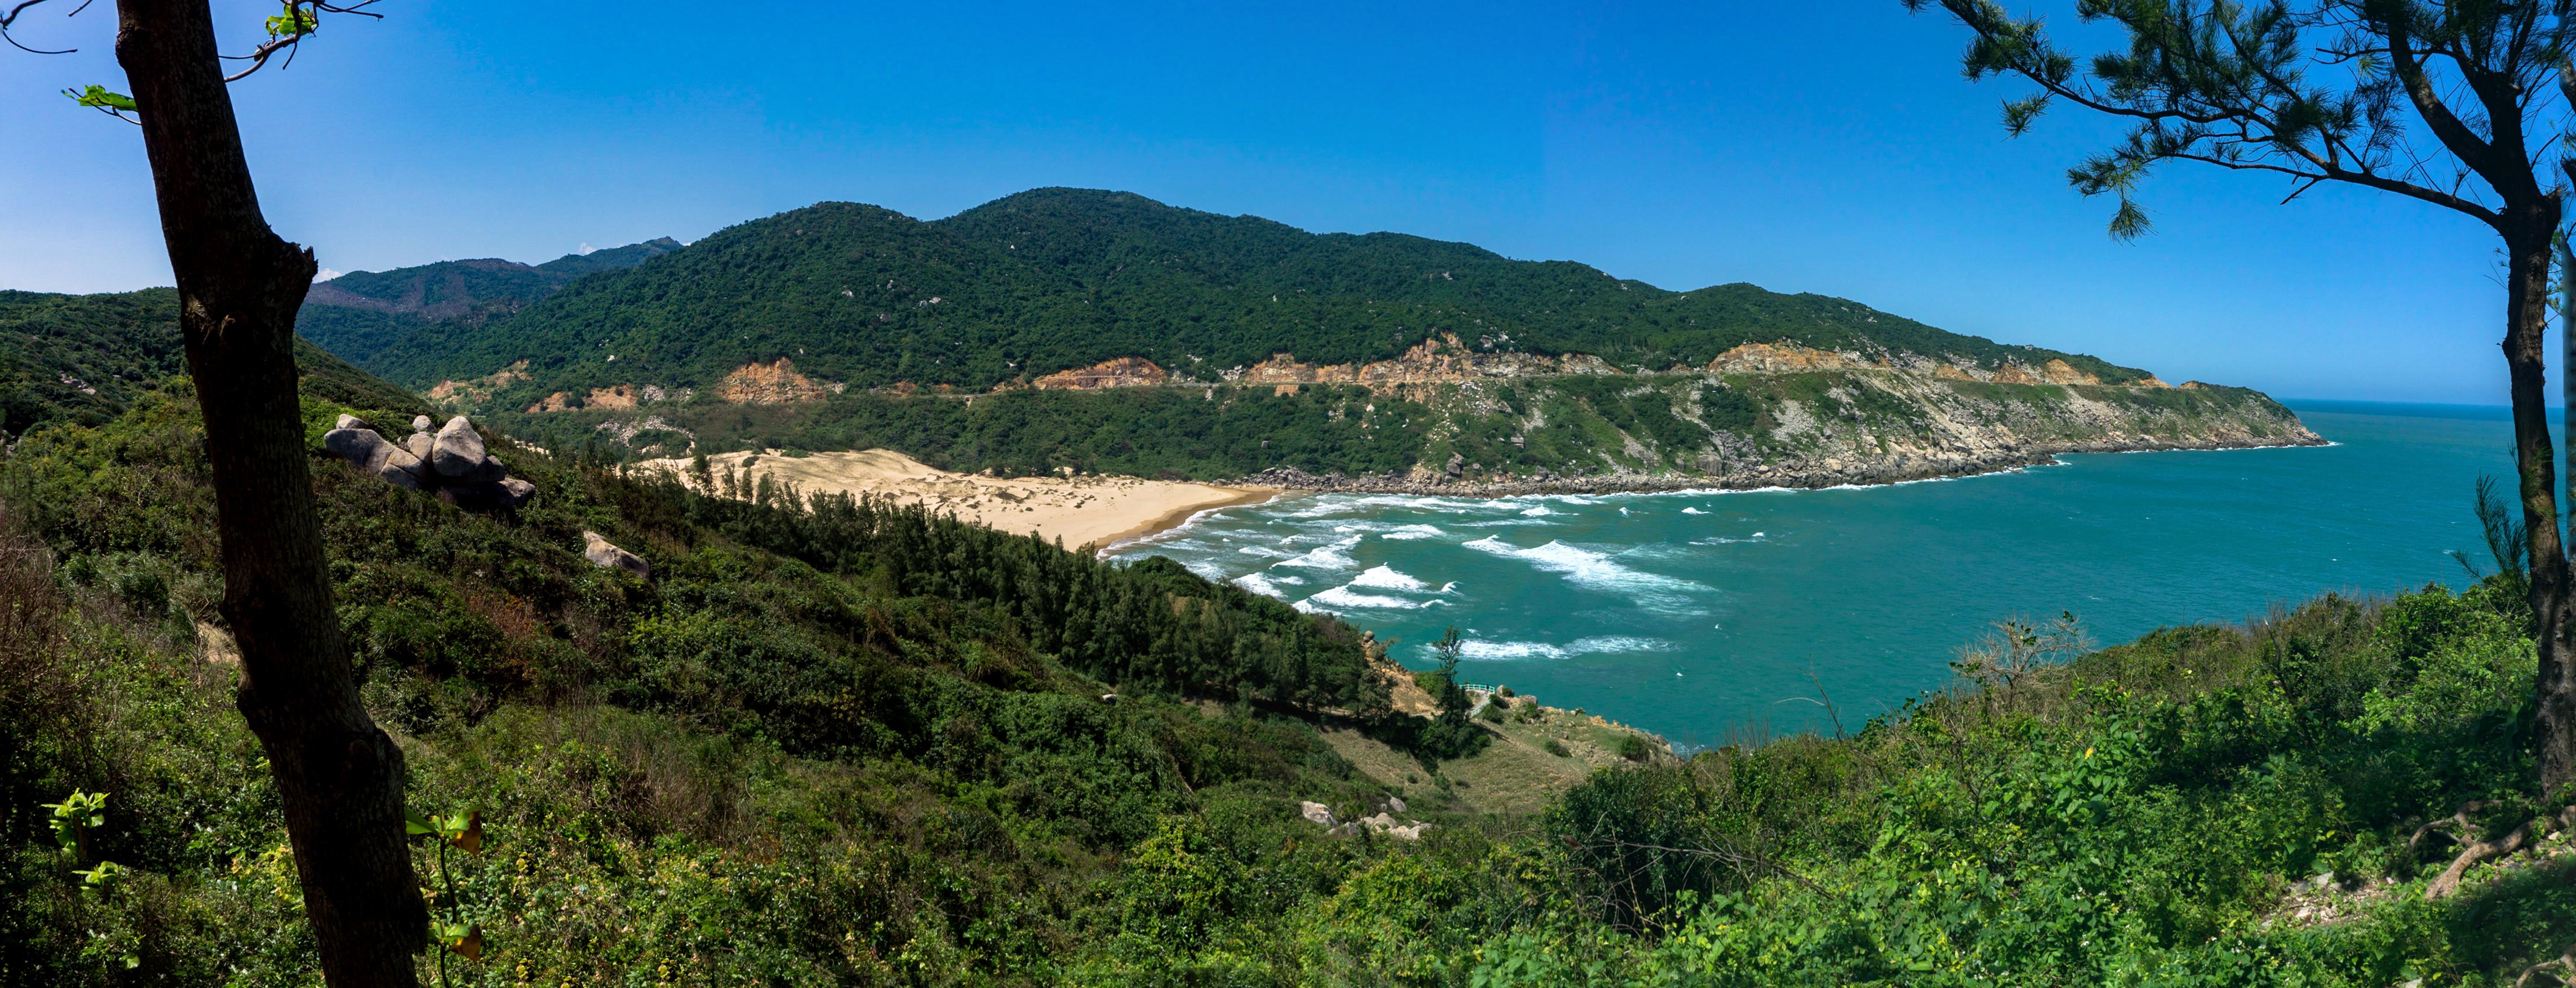 Tuy Hòa to Nha Trang: Untamed coastal beauty